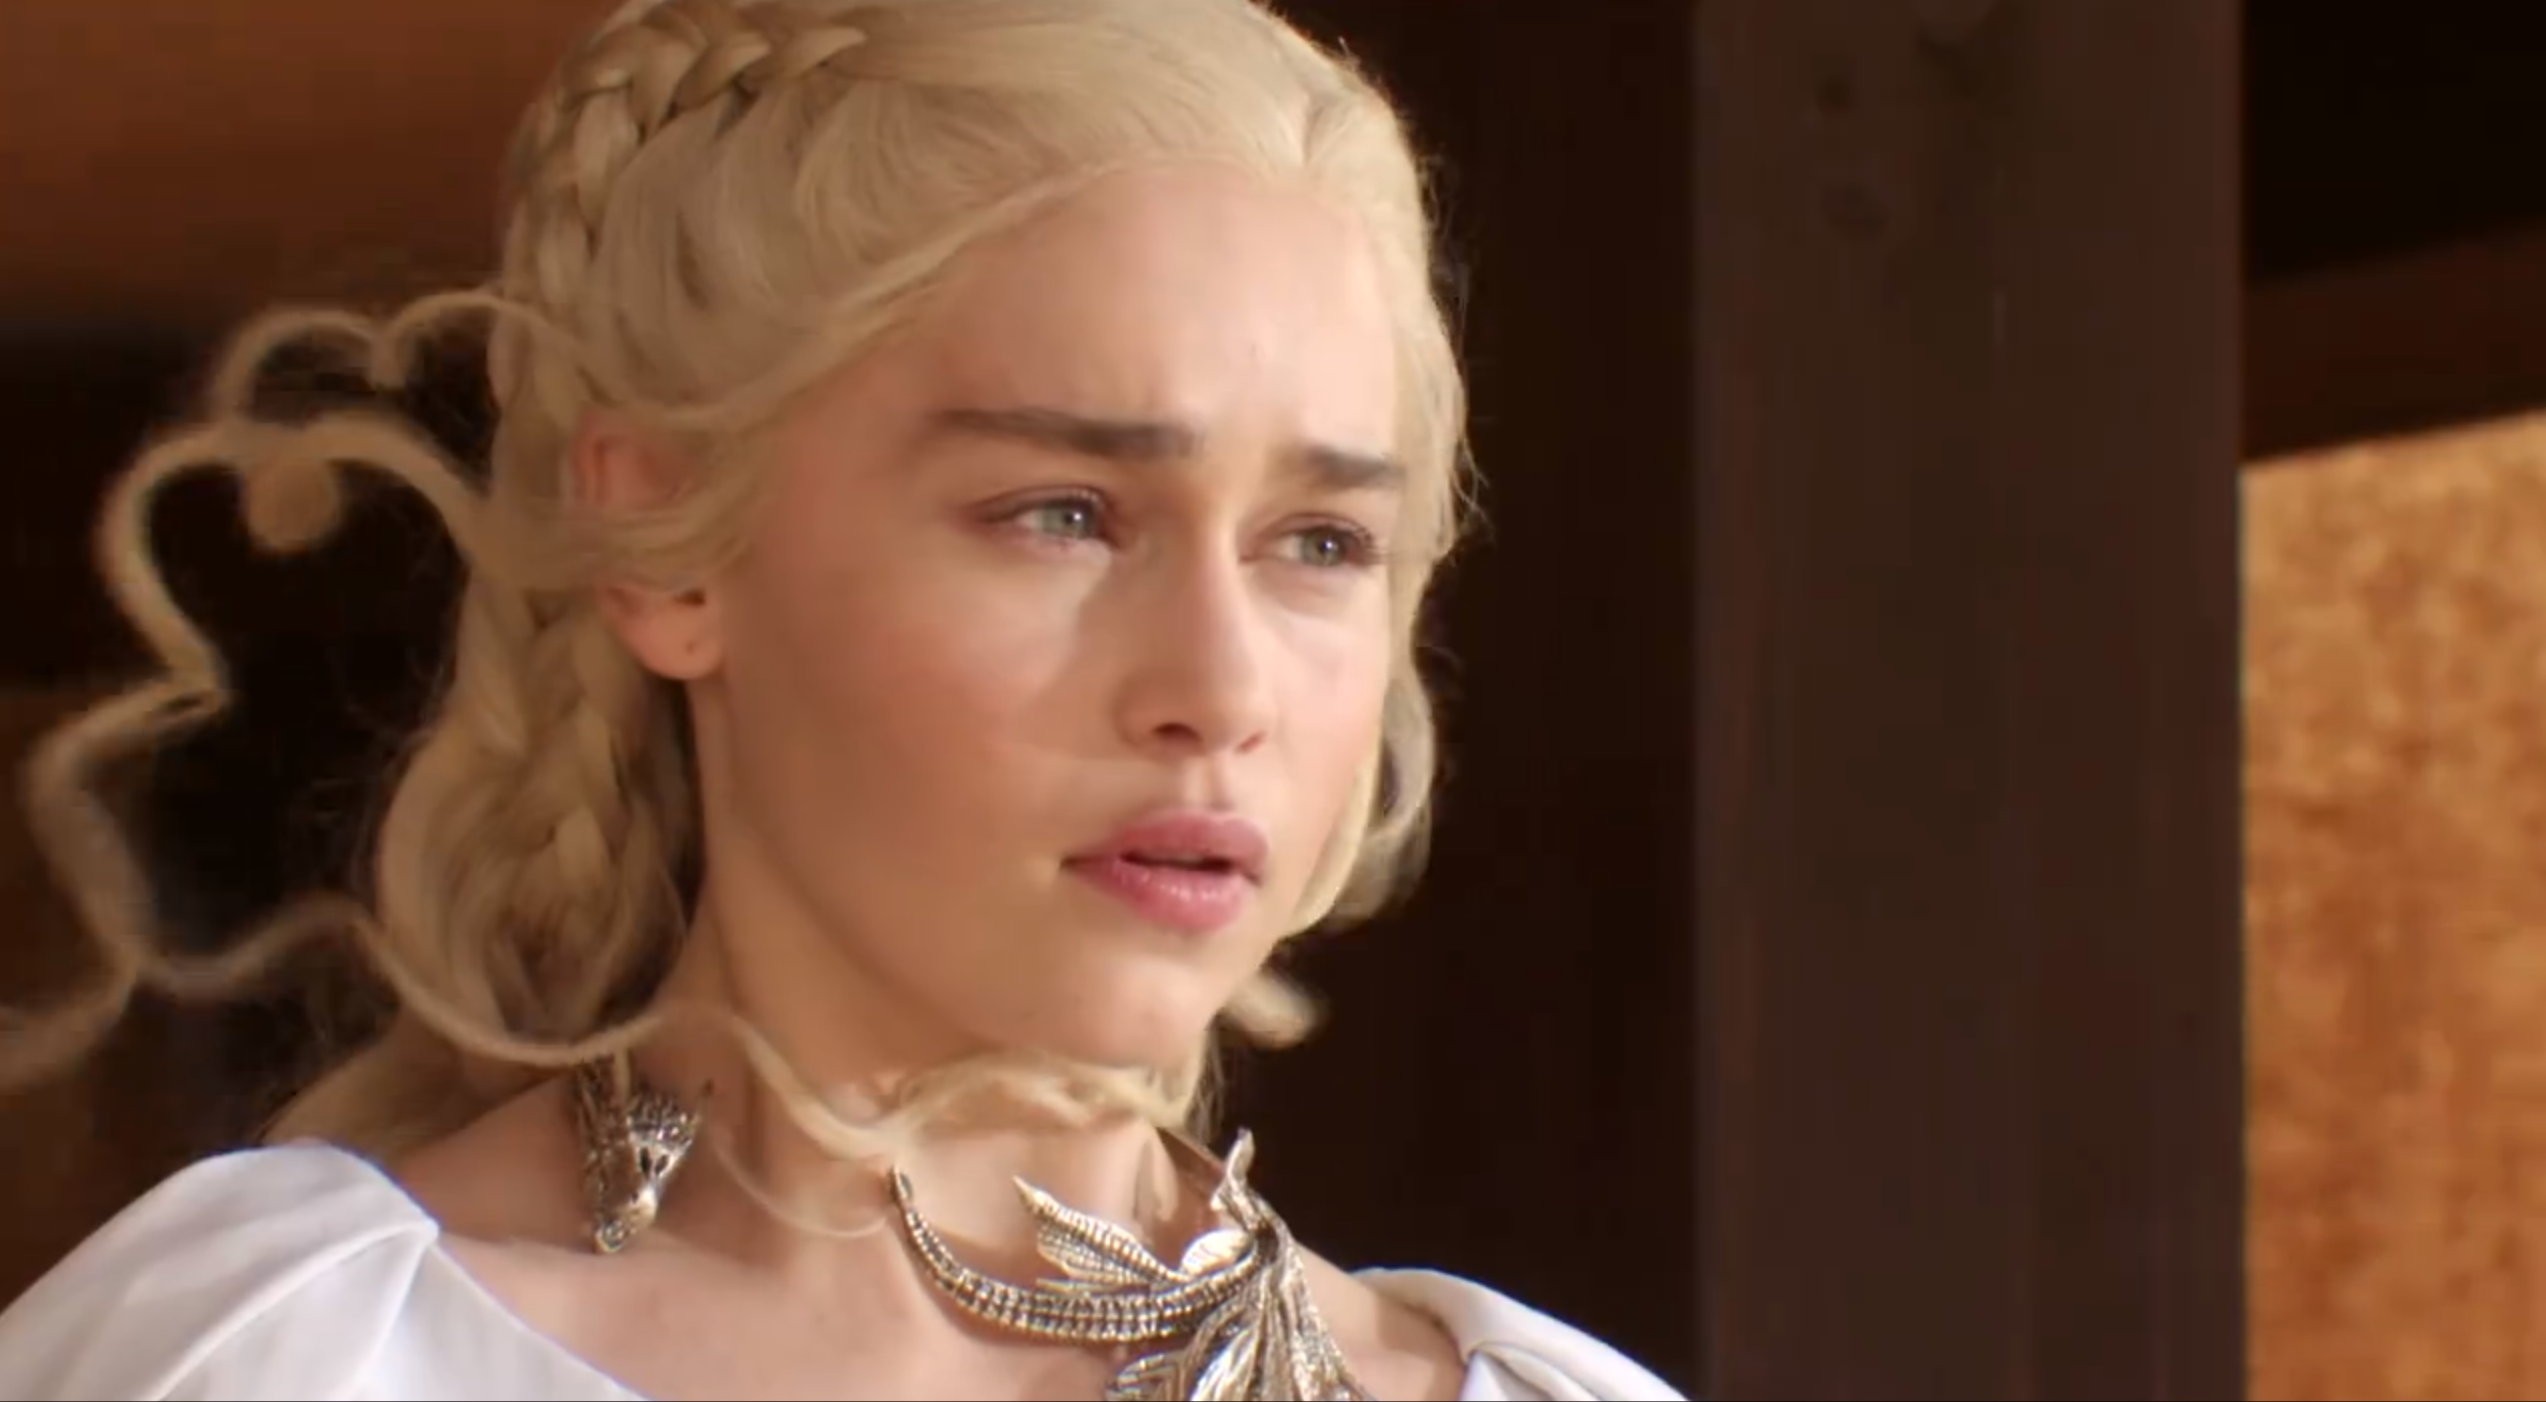 Daenerys targaryen season 5 closer look at the dragon for Daenerys jewelry season 7